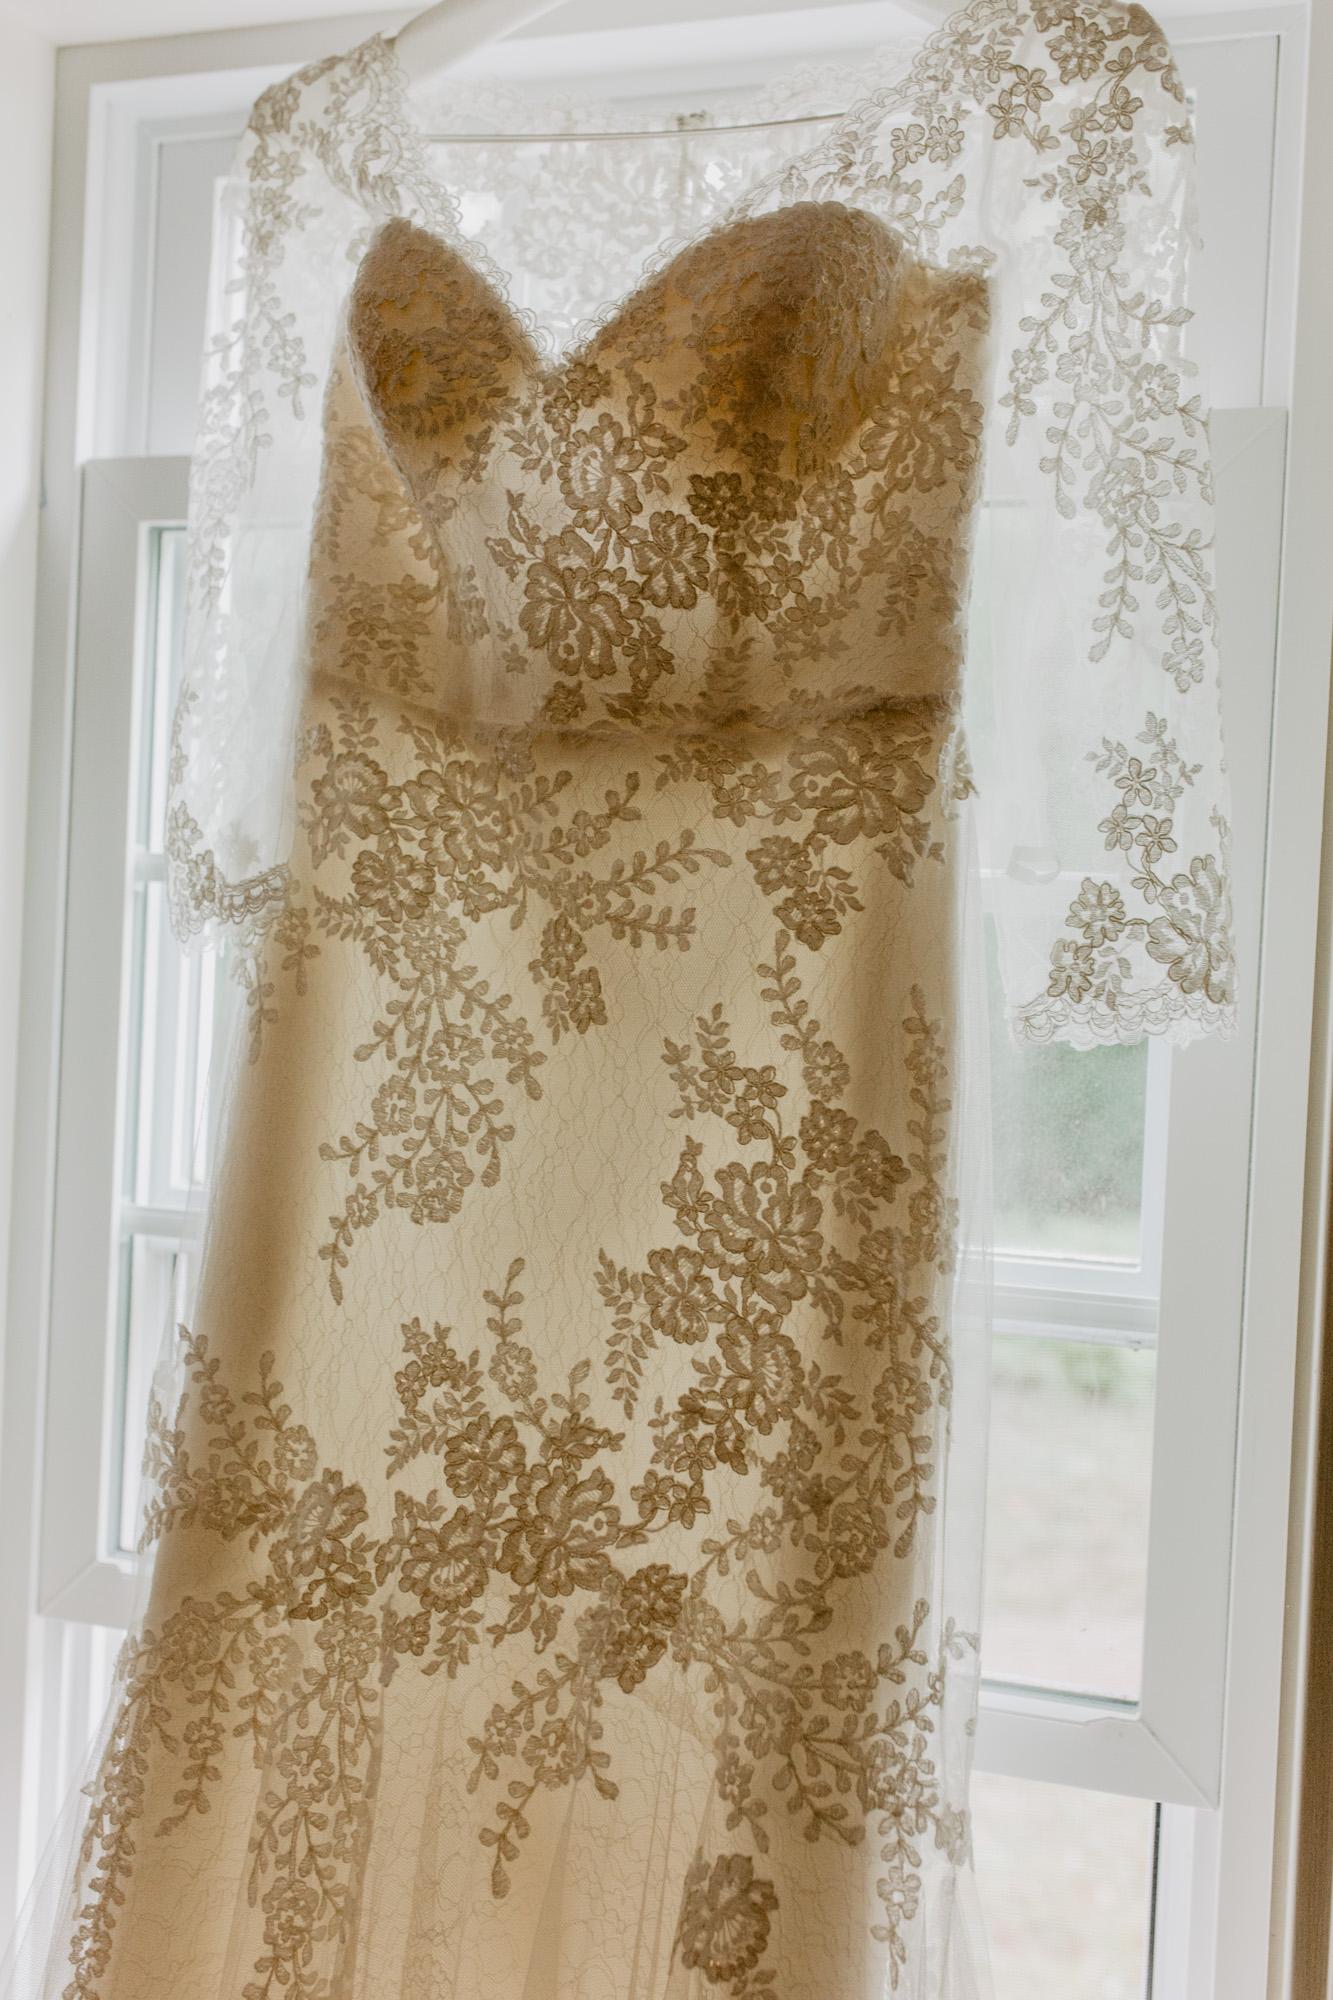 The bride's lacy wedding dress hangs by a window